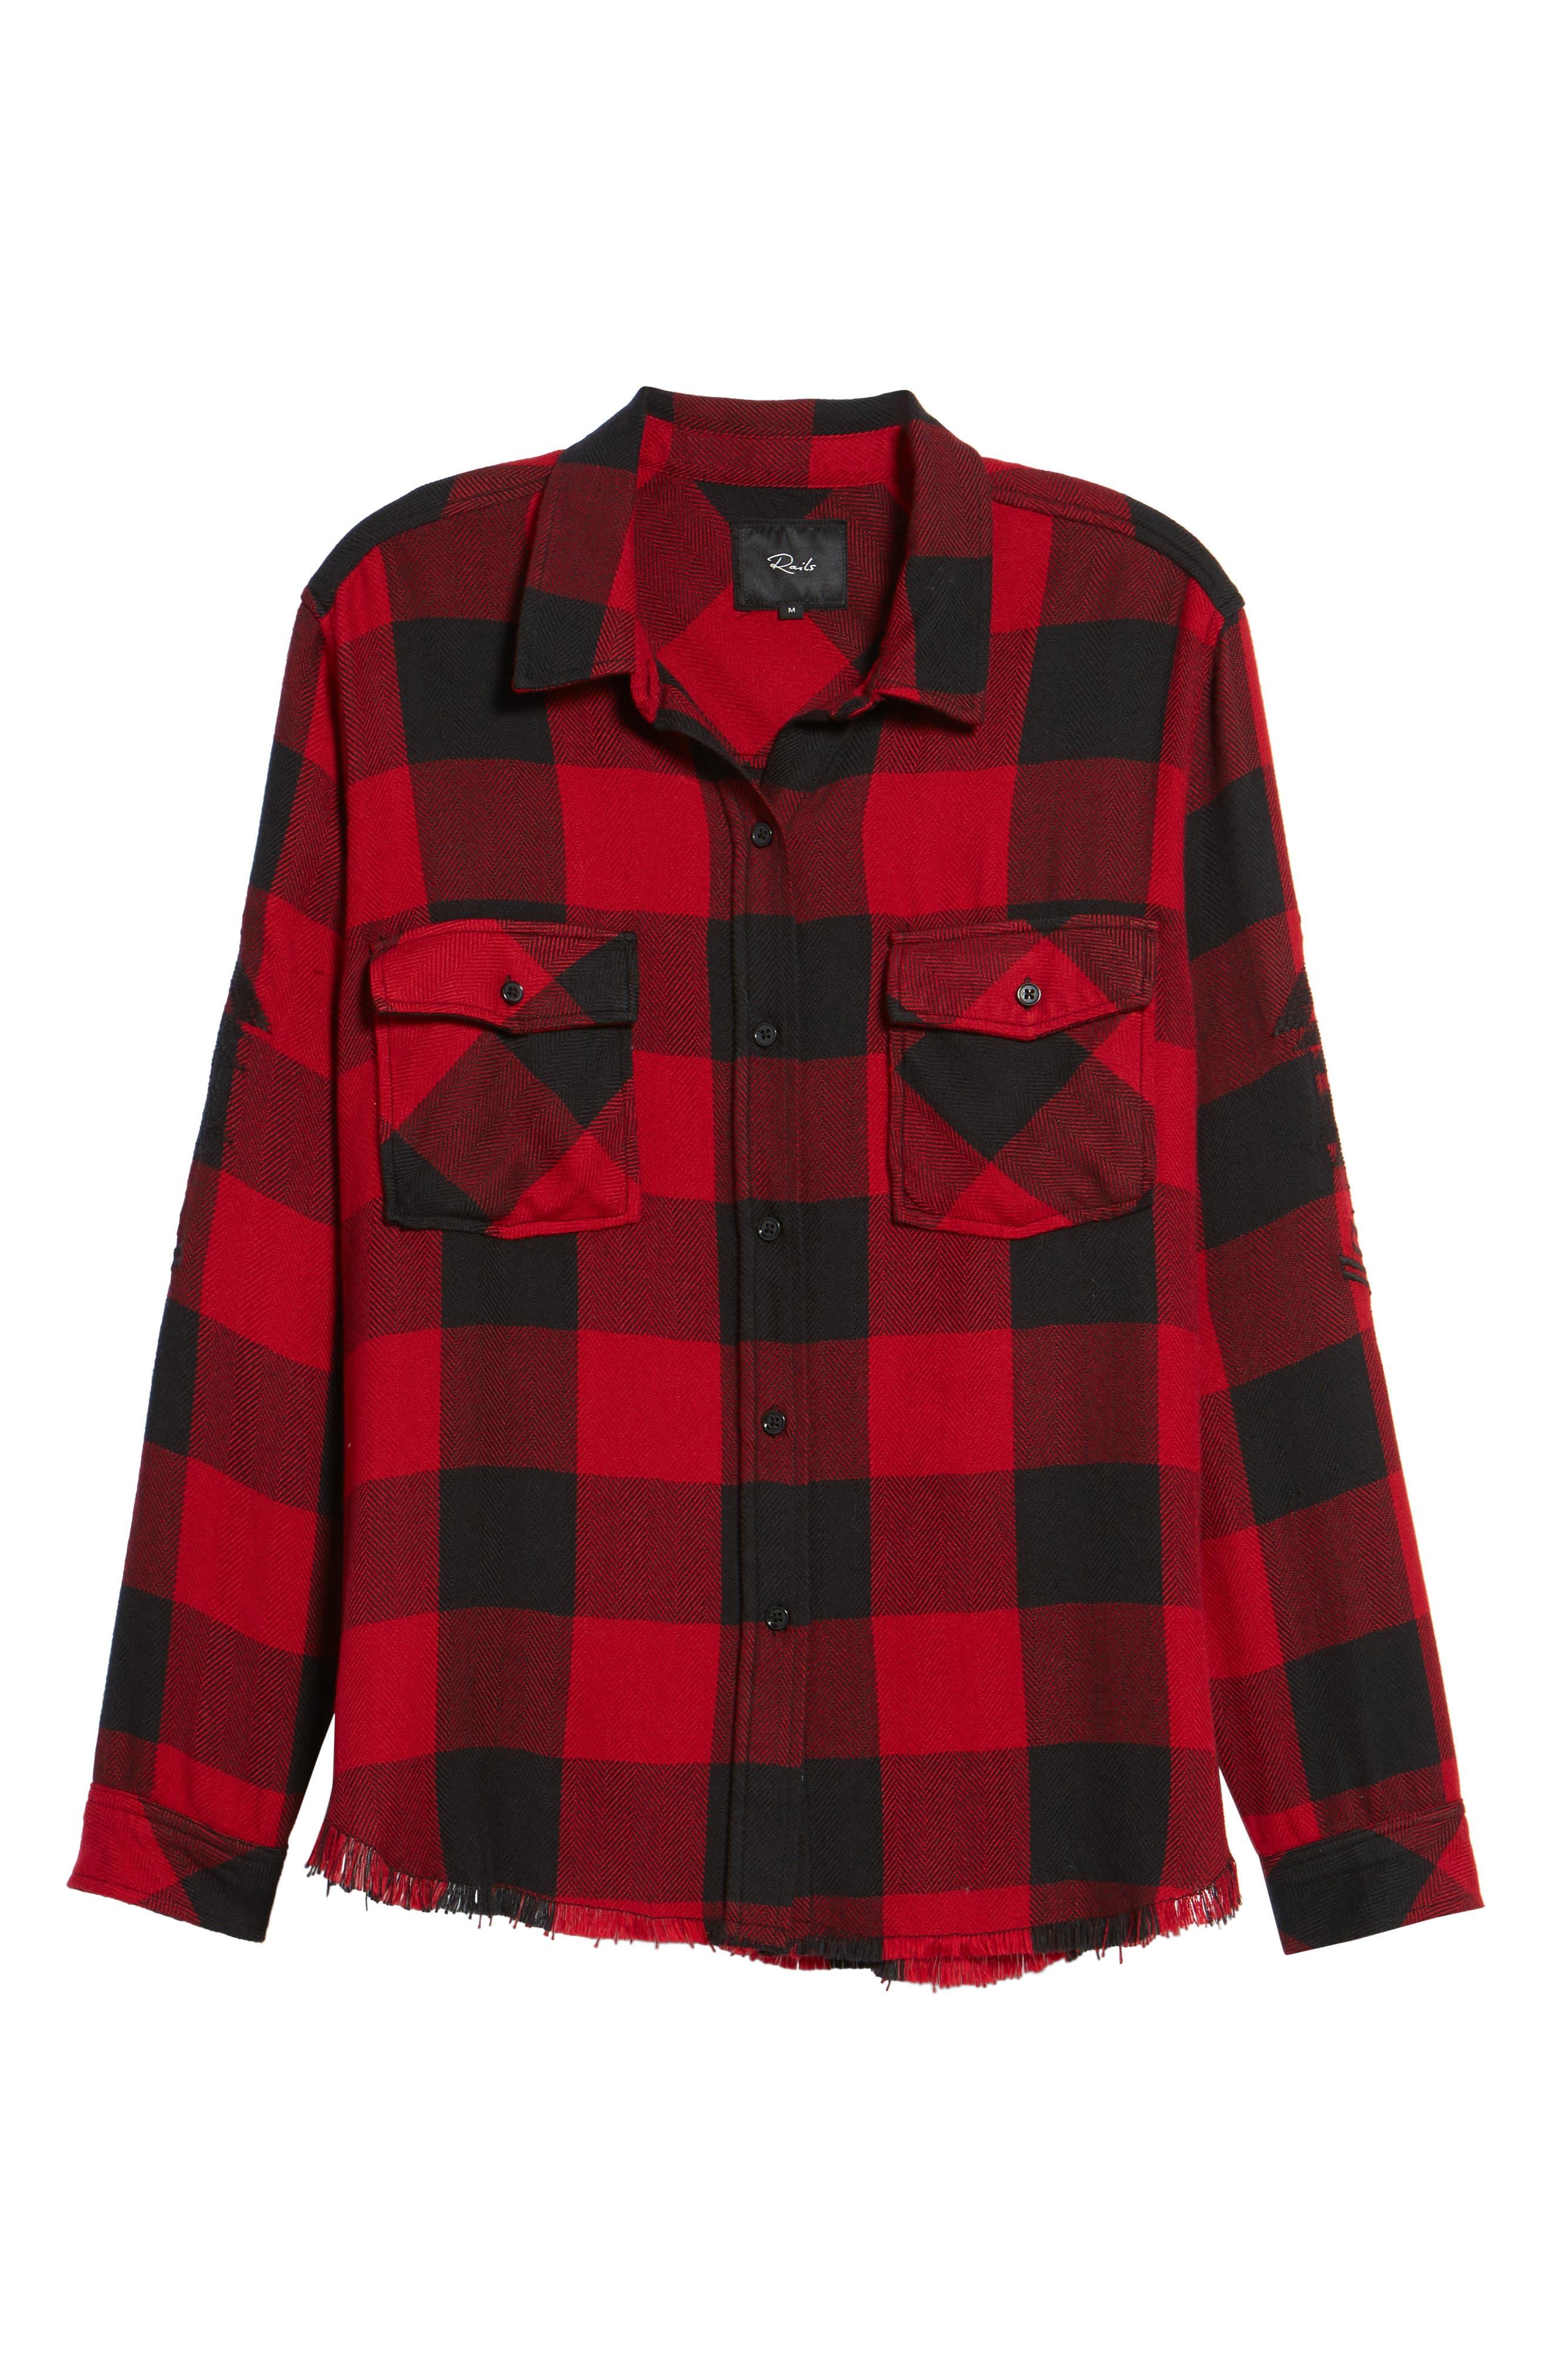 Larsson Embroidered Flannel Shirt,                             Alternate thumbnail 7, color,                             Crimson Jet